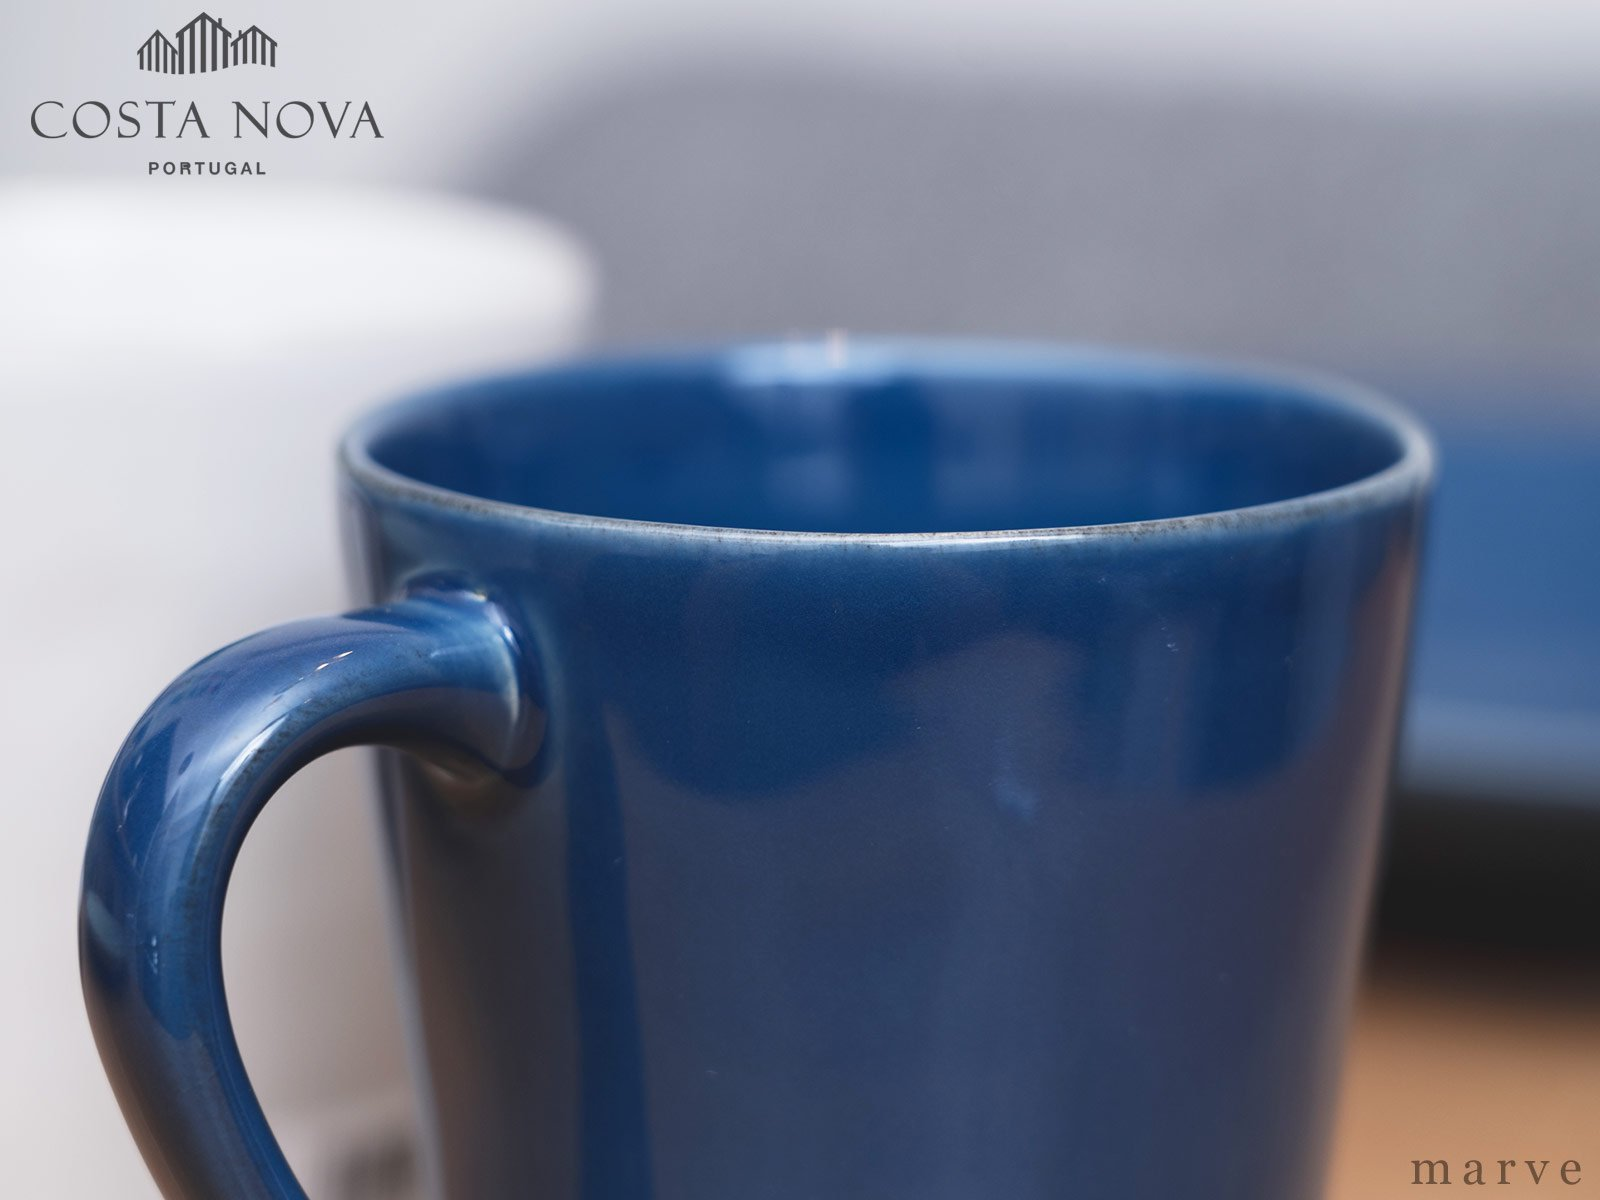 COSTA NOVA(コスタ・ノバ) ノバ マグカップ デニム